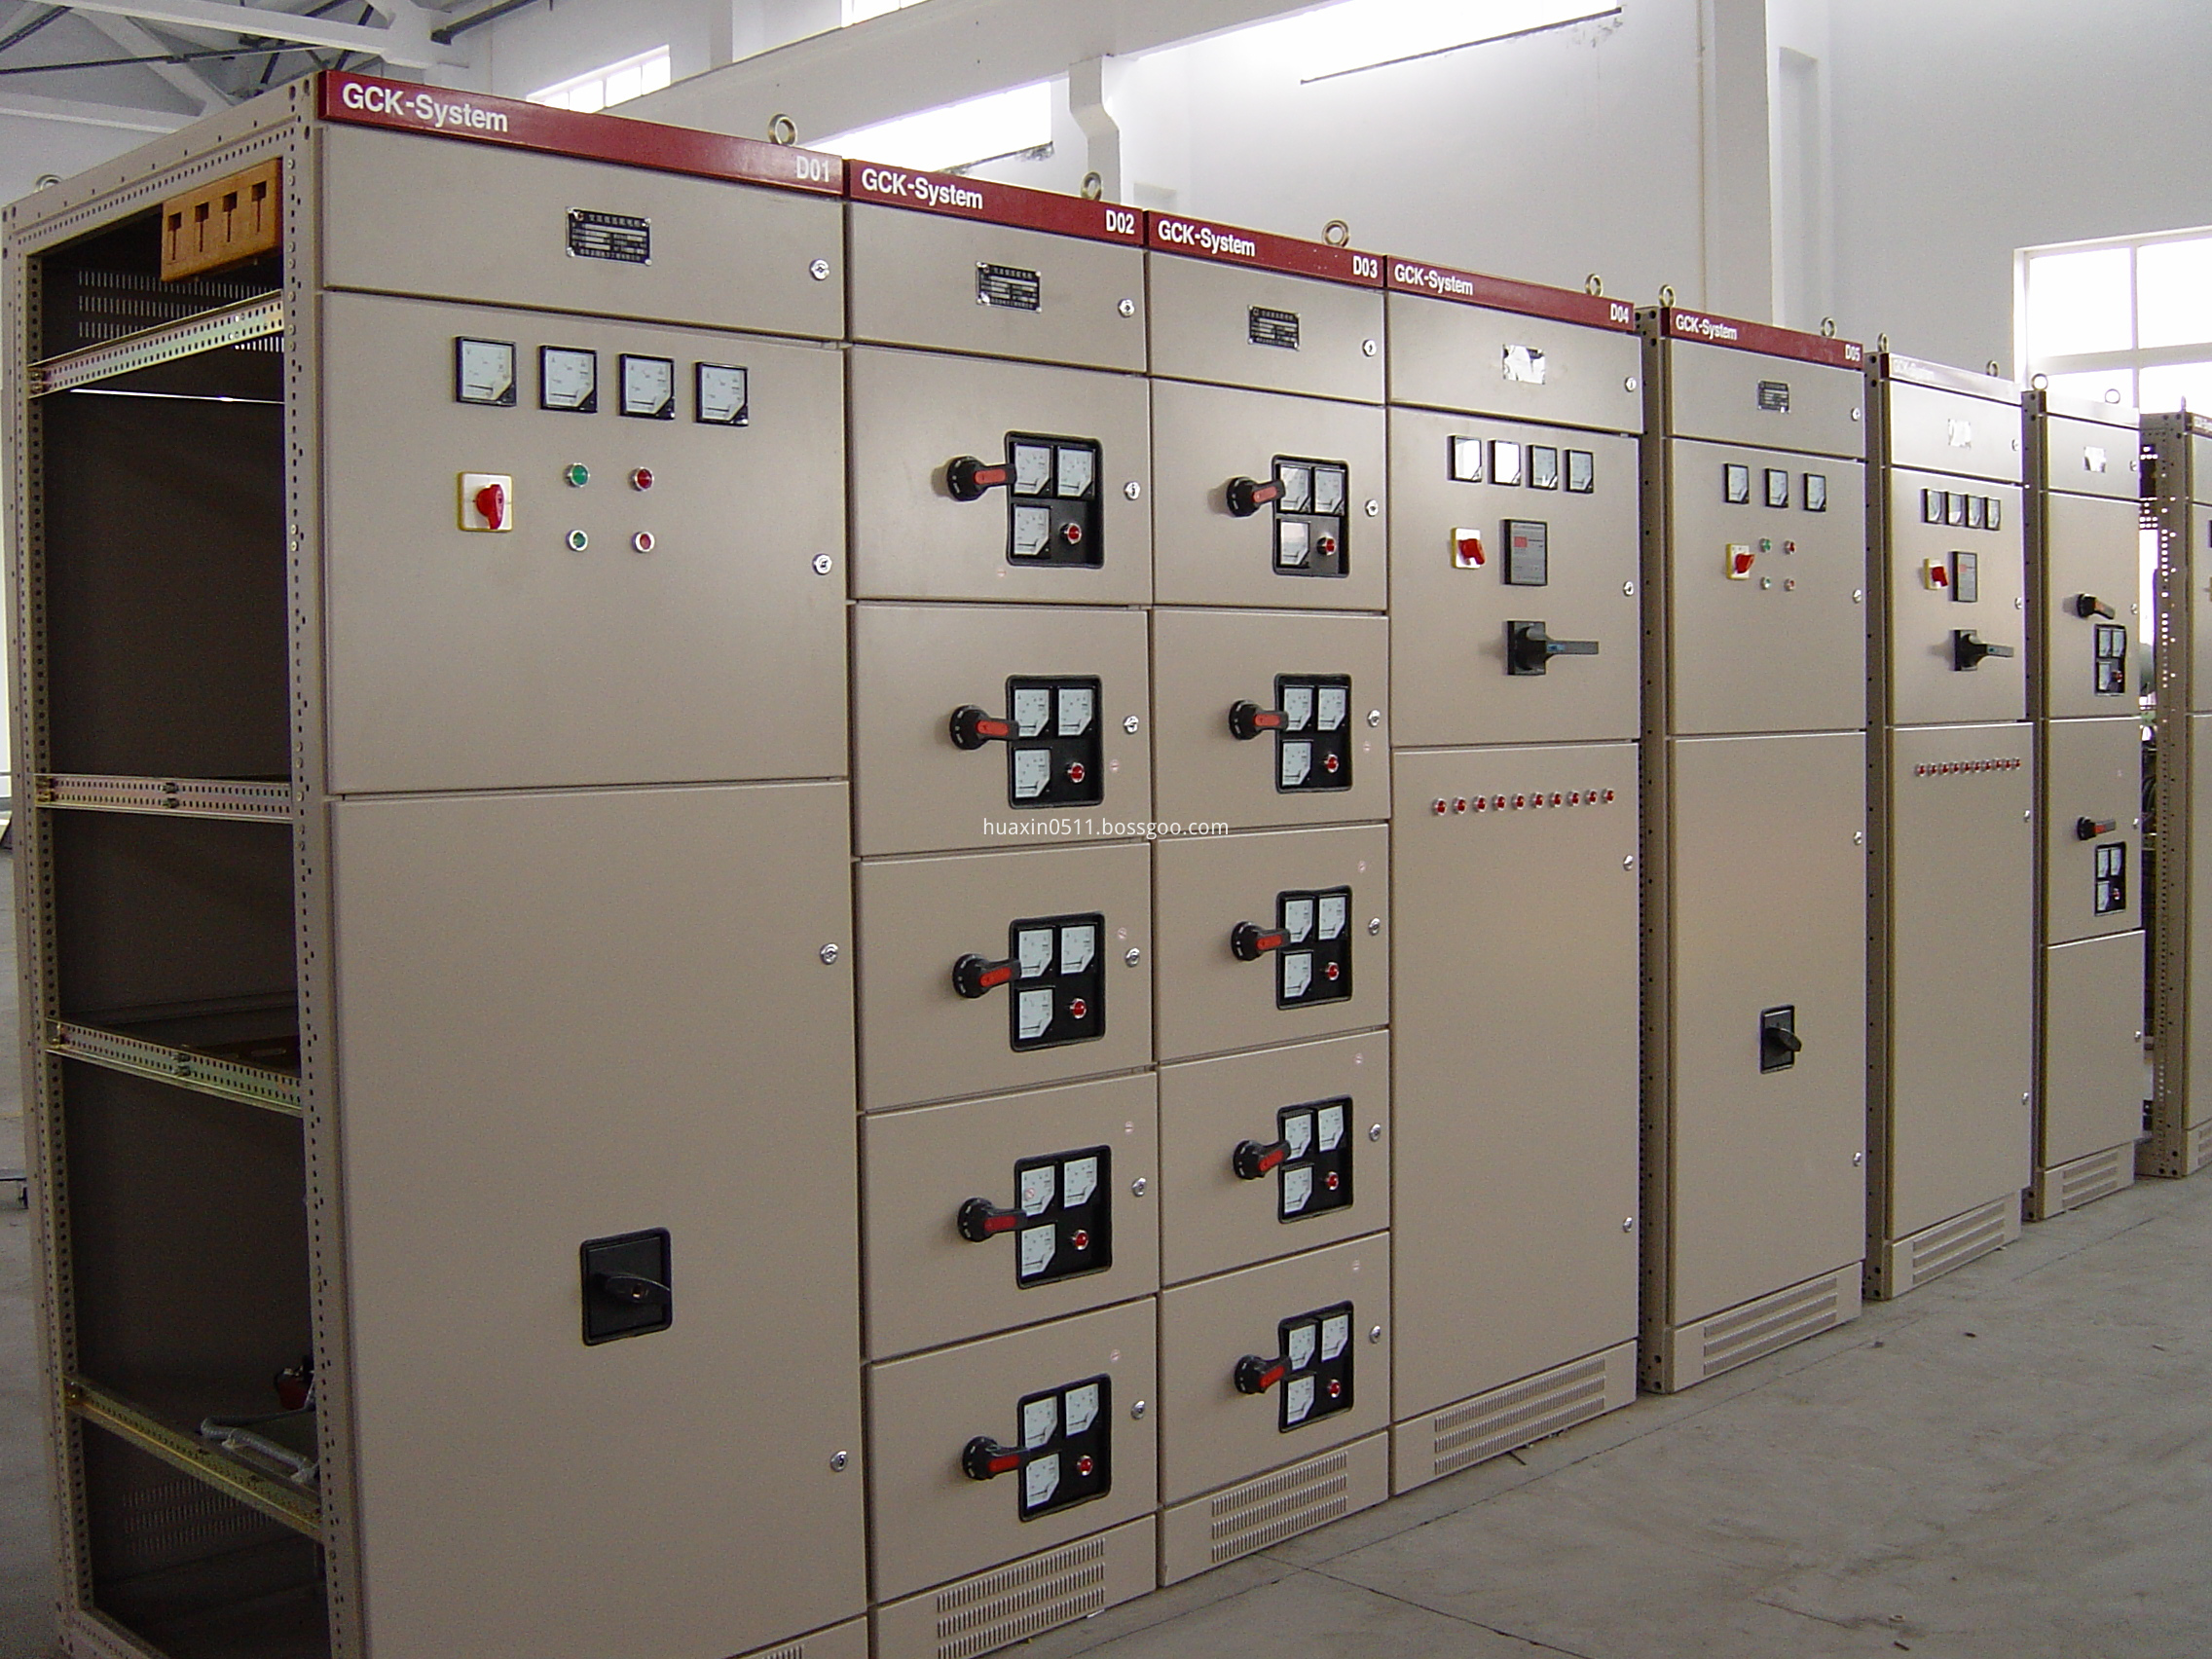 LV switchgear GCK